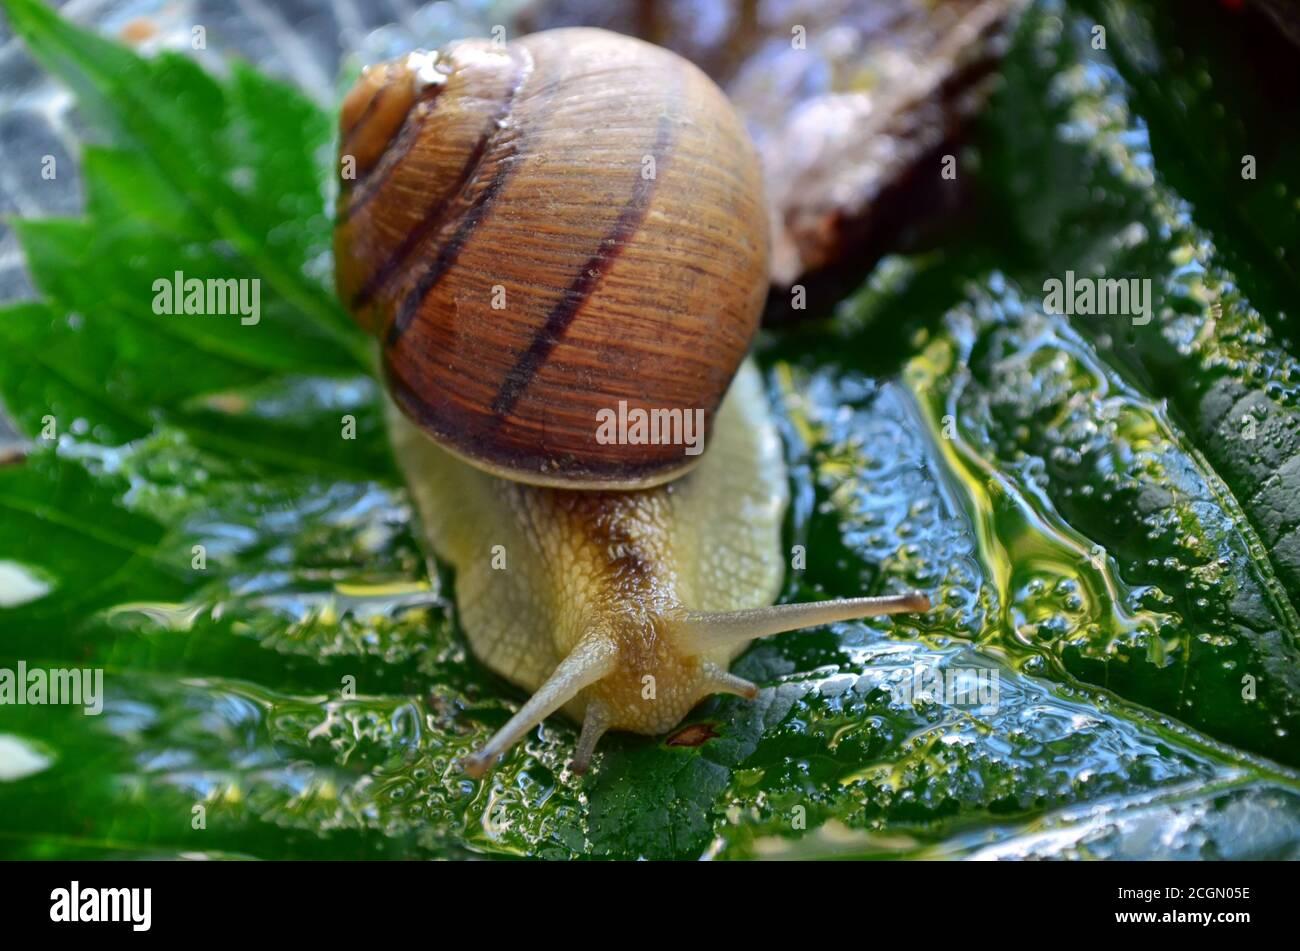 Gastropod. Common garden snail crawling on a green leaf. Fauna of Ukraine. Shallow depth of field, closeup. Stock Photo